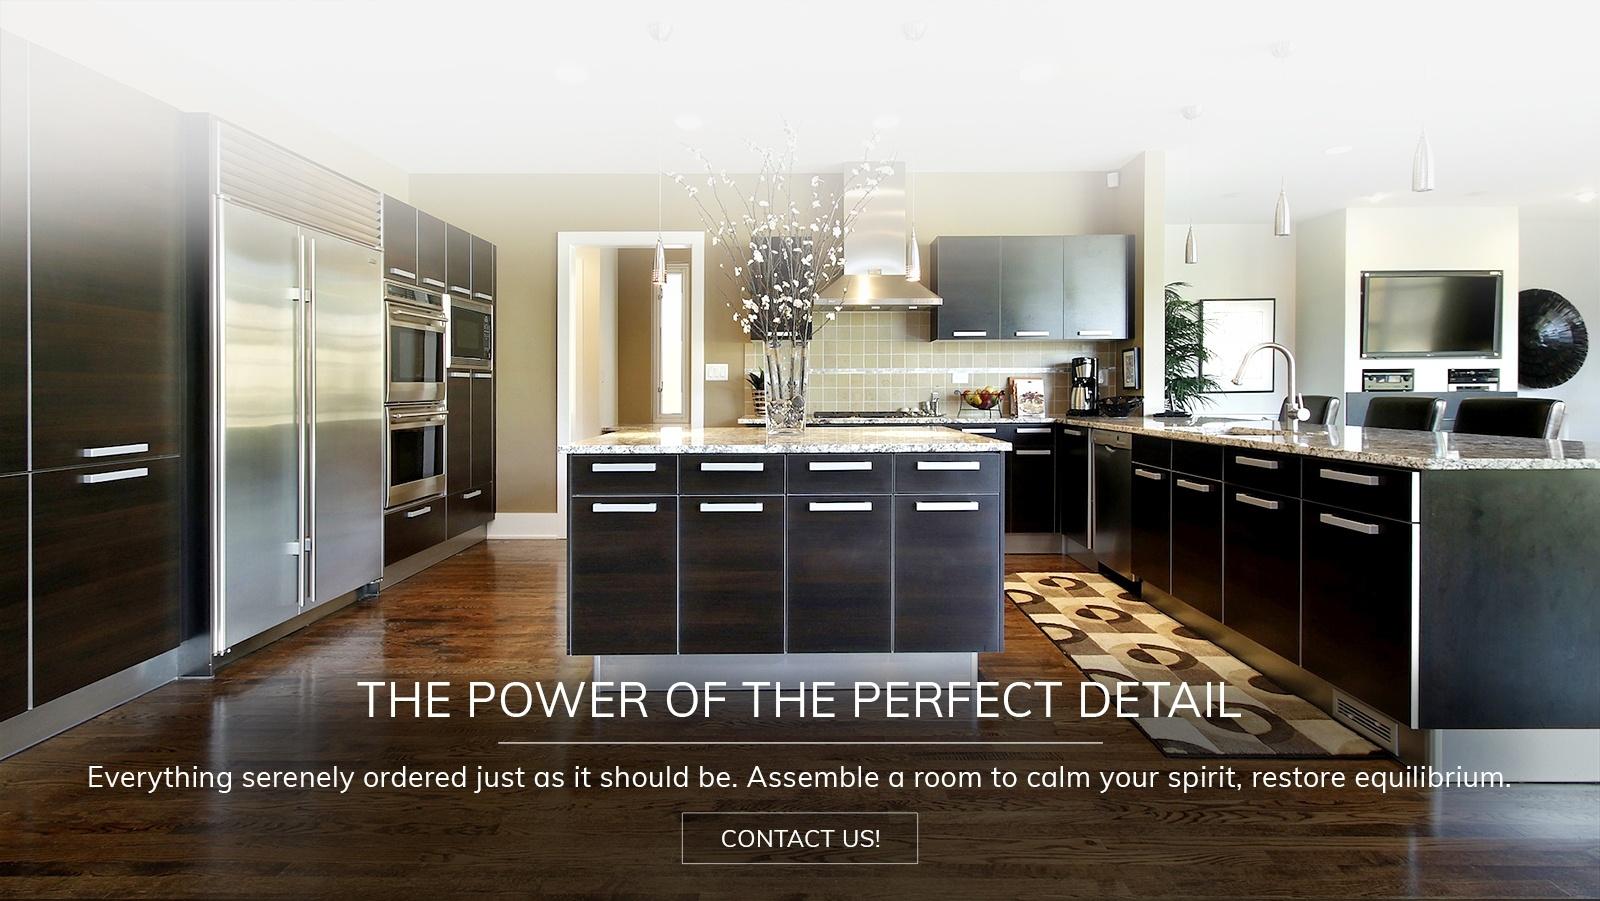 Best Interior Design Home Renovation Company In Atlanta Ga